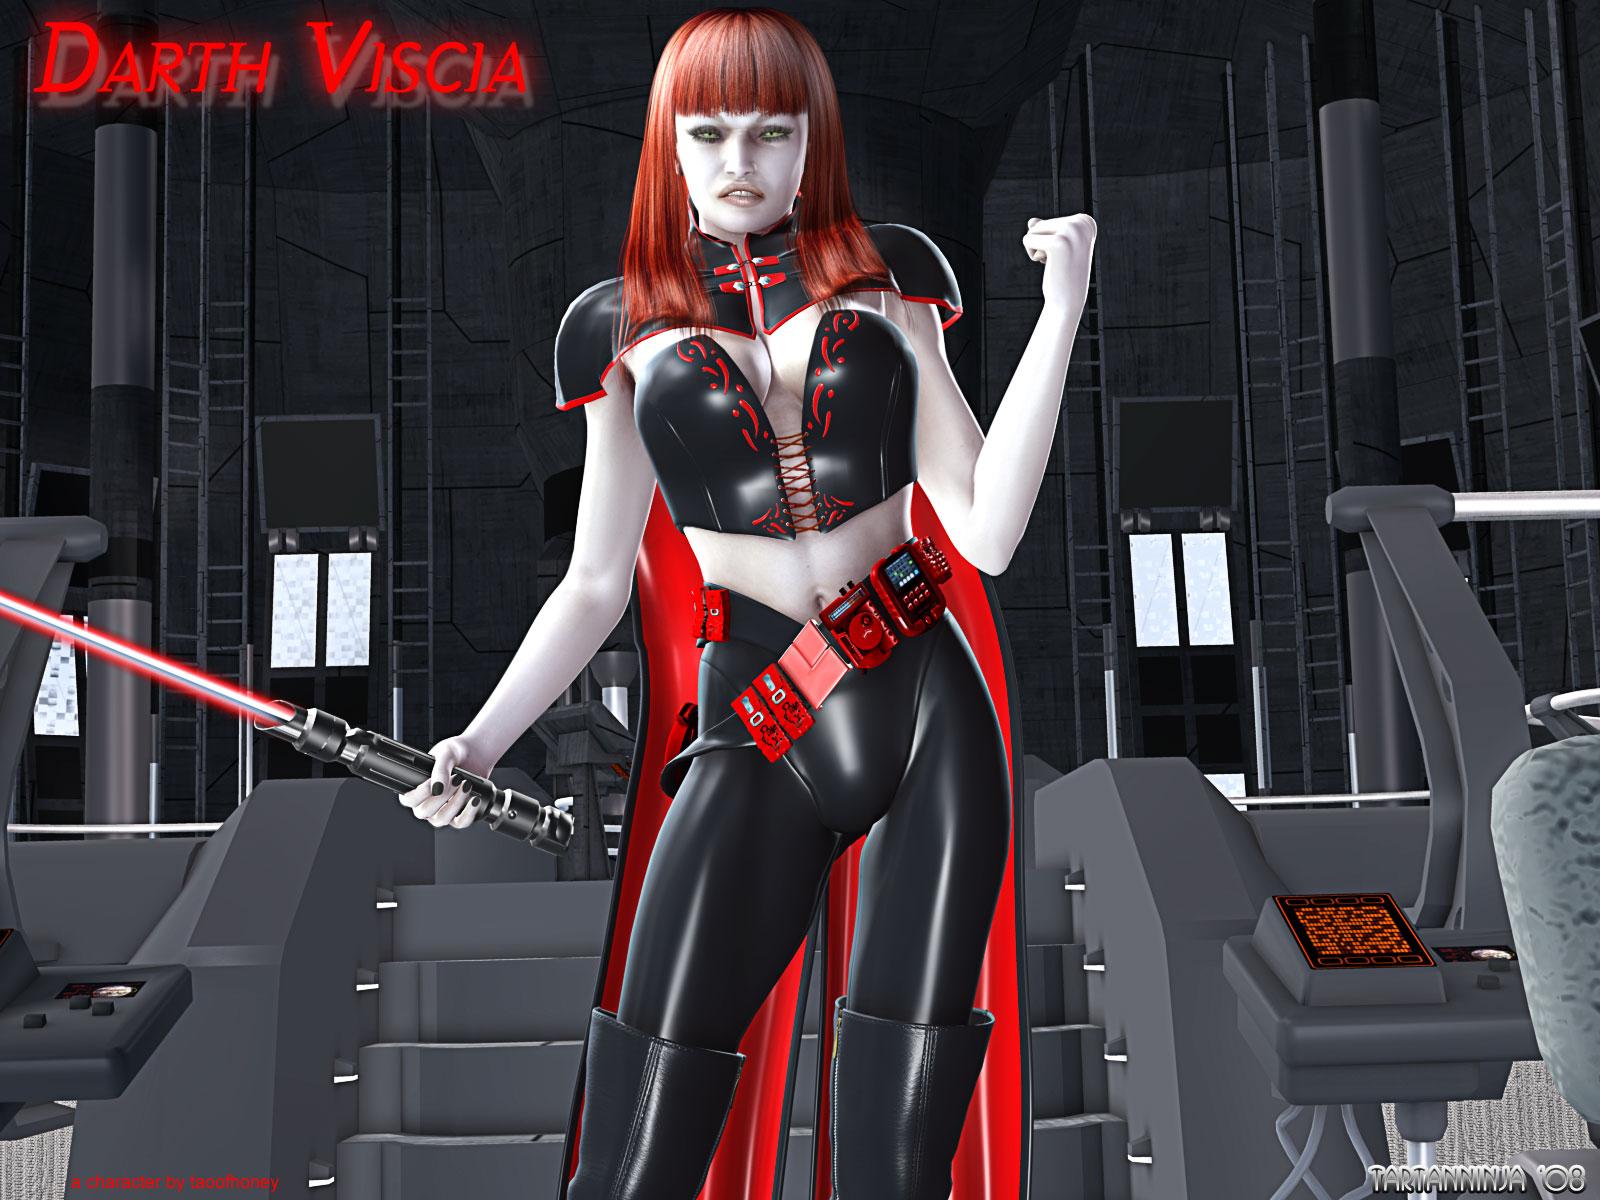 Darth Viscia